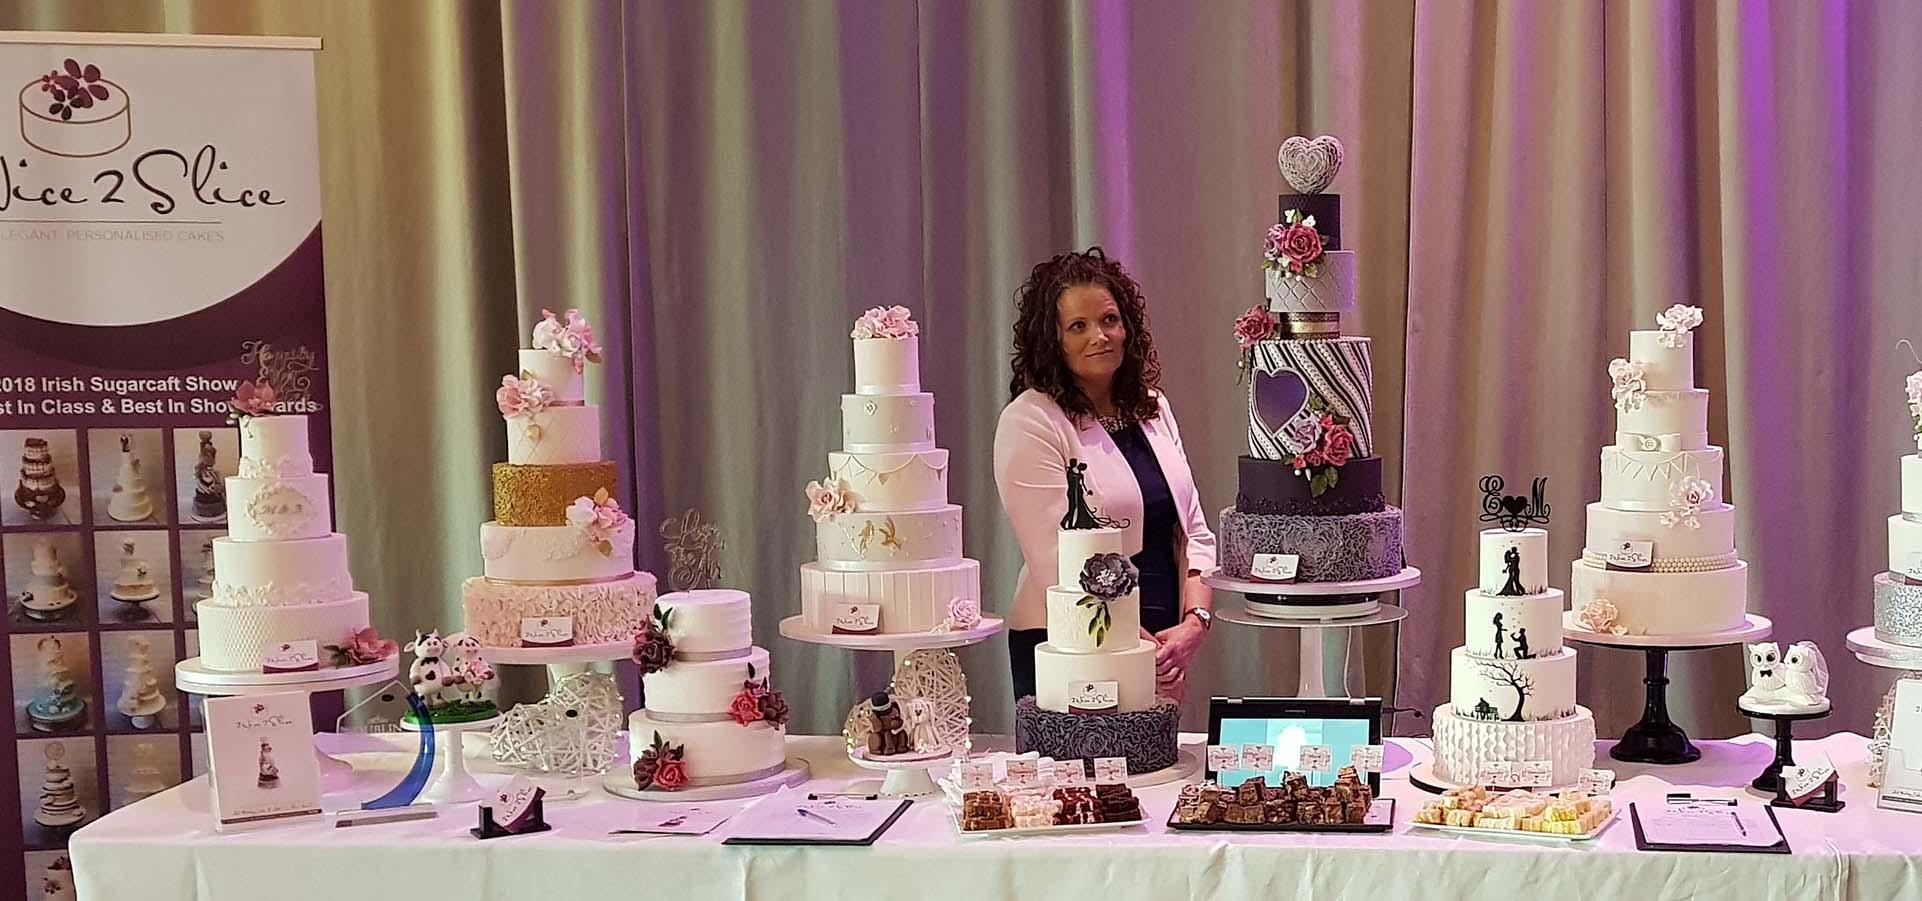 Wedding Cakes - 2 Nice 2 Slice